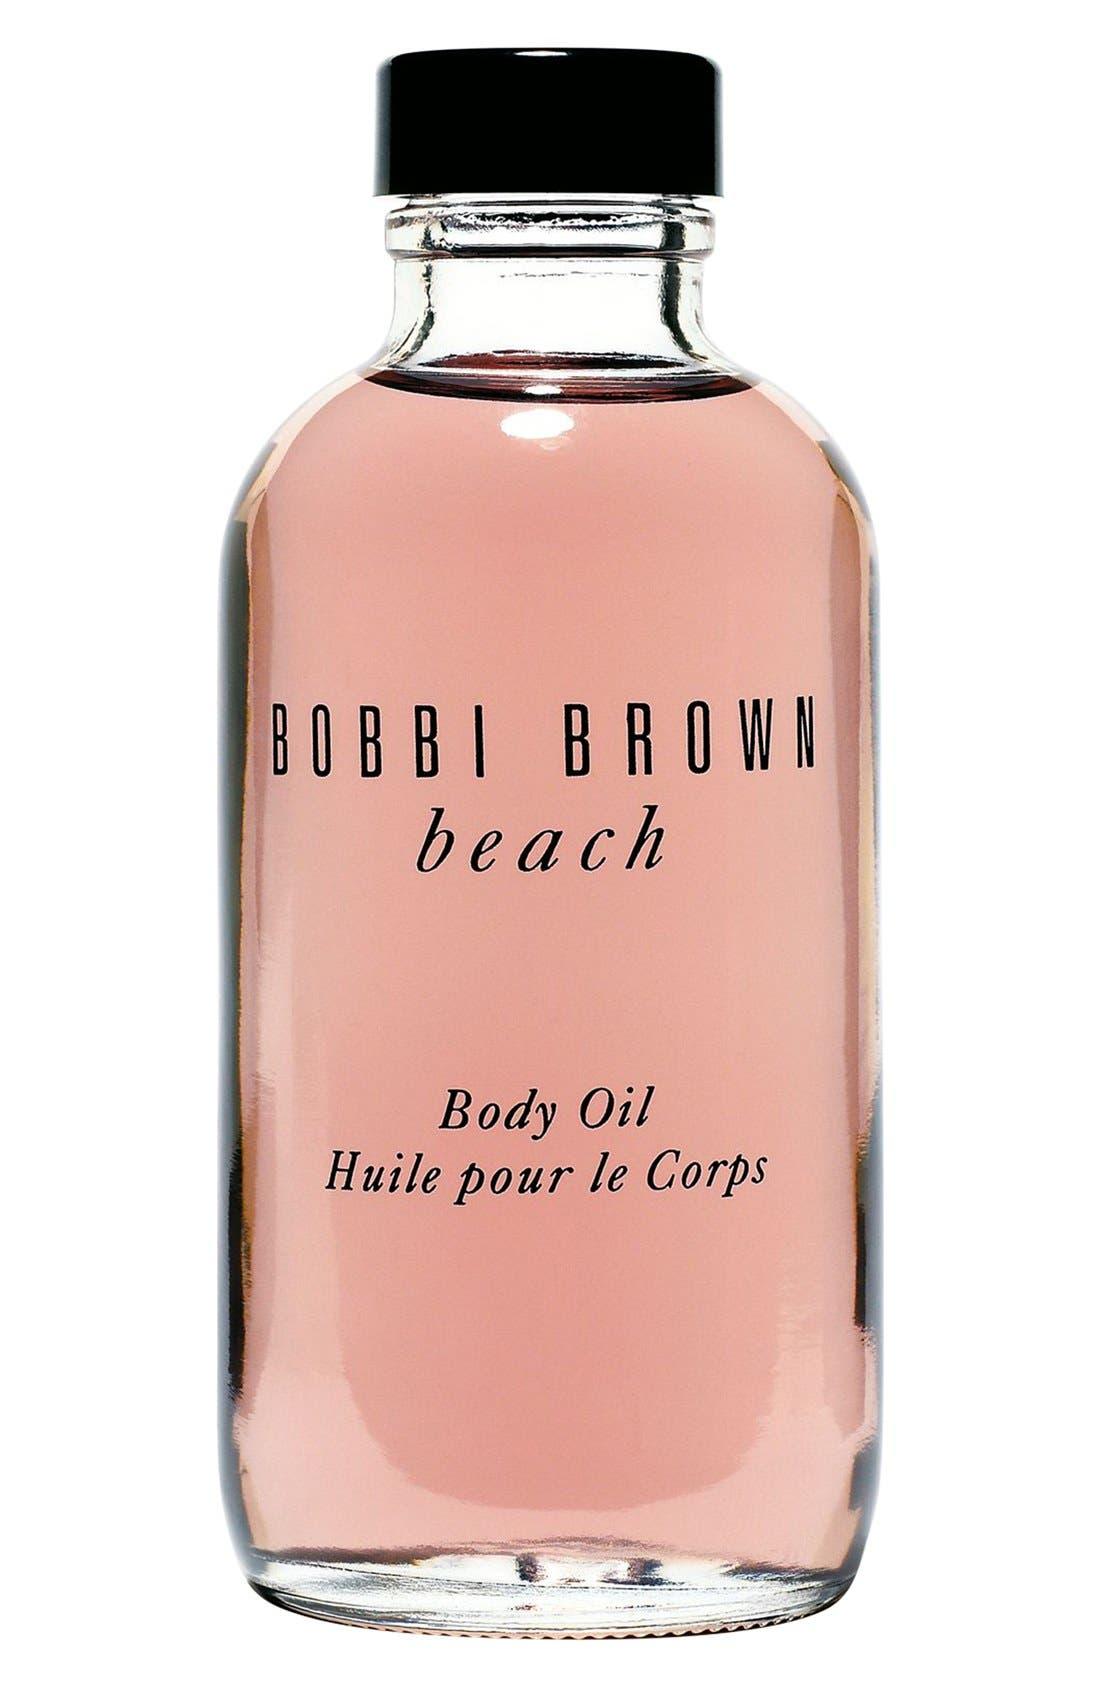 BOBBI BROWN 'beach' Body Oil, Main, color, 000